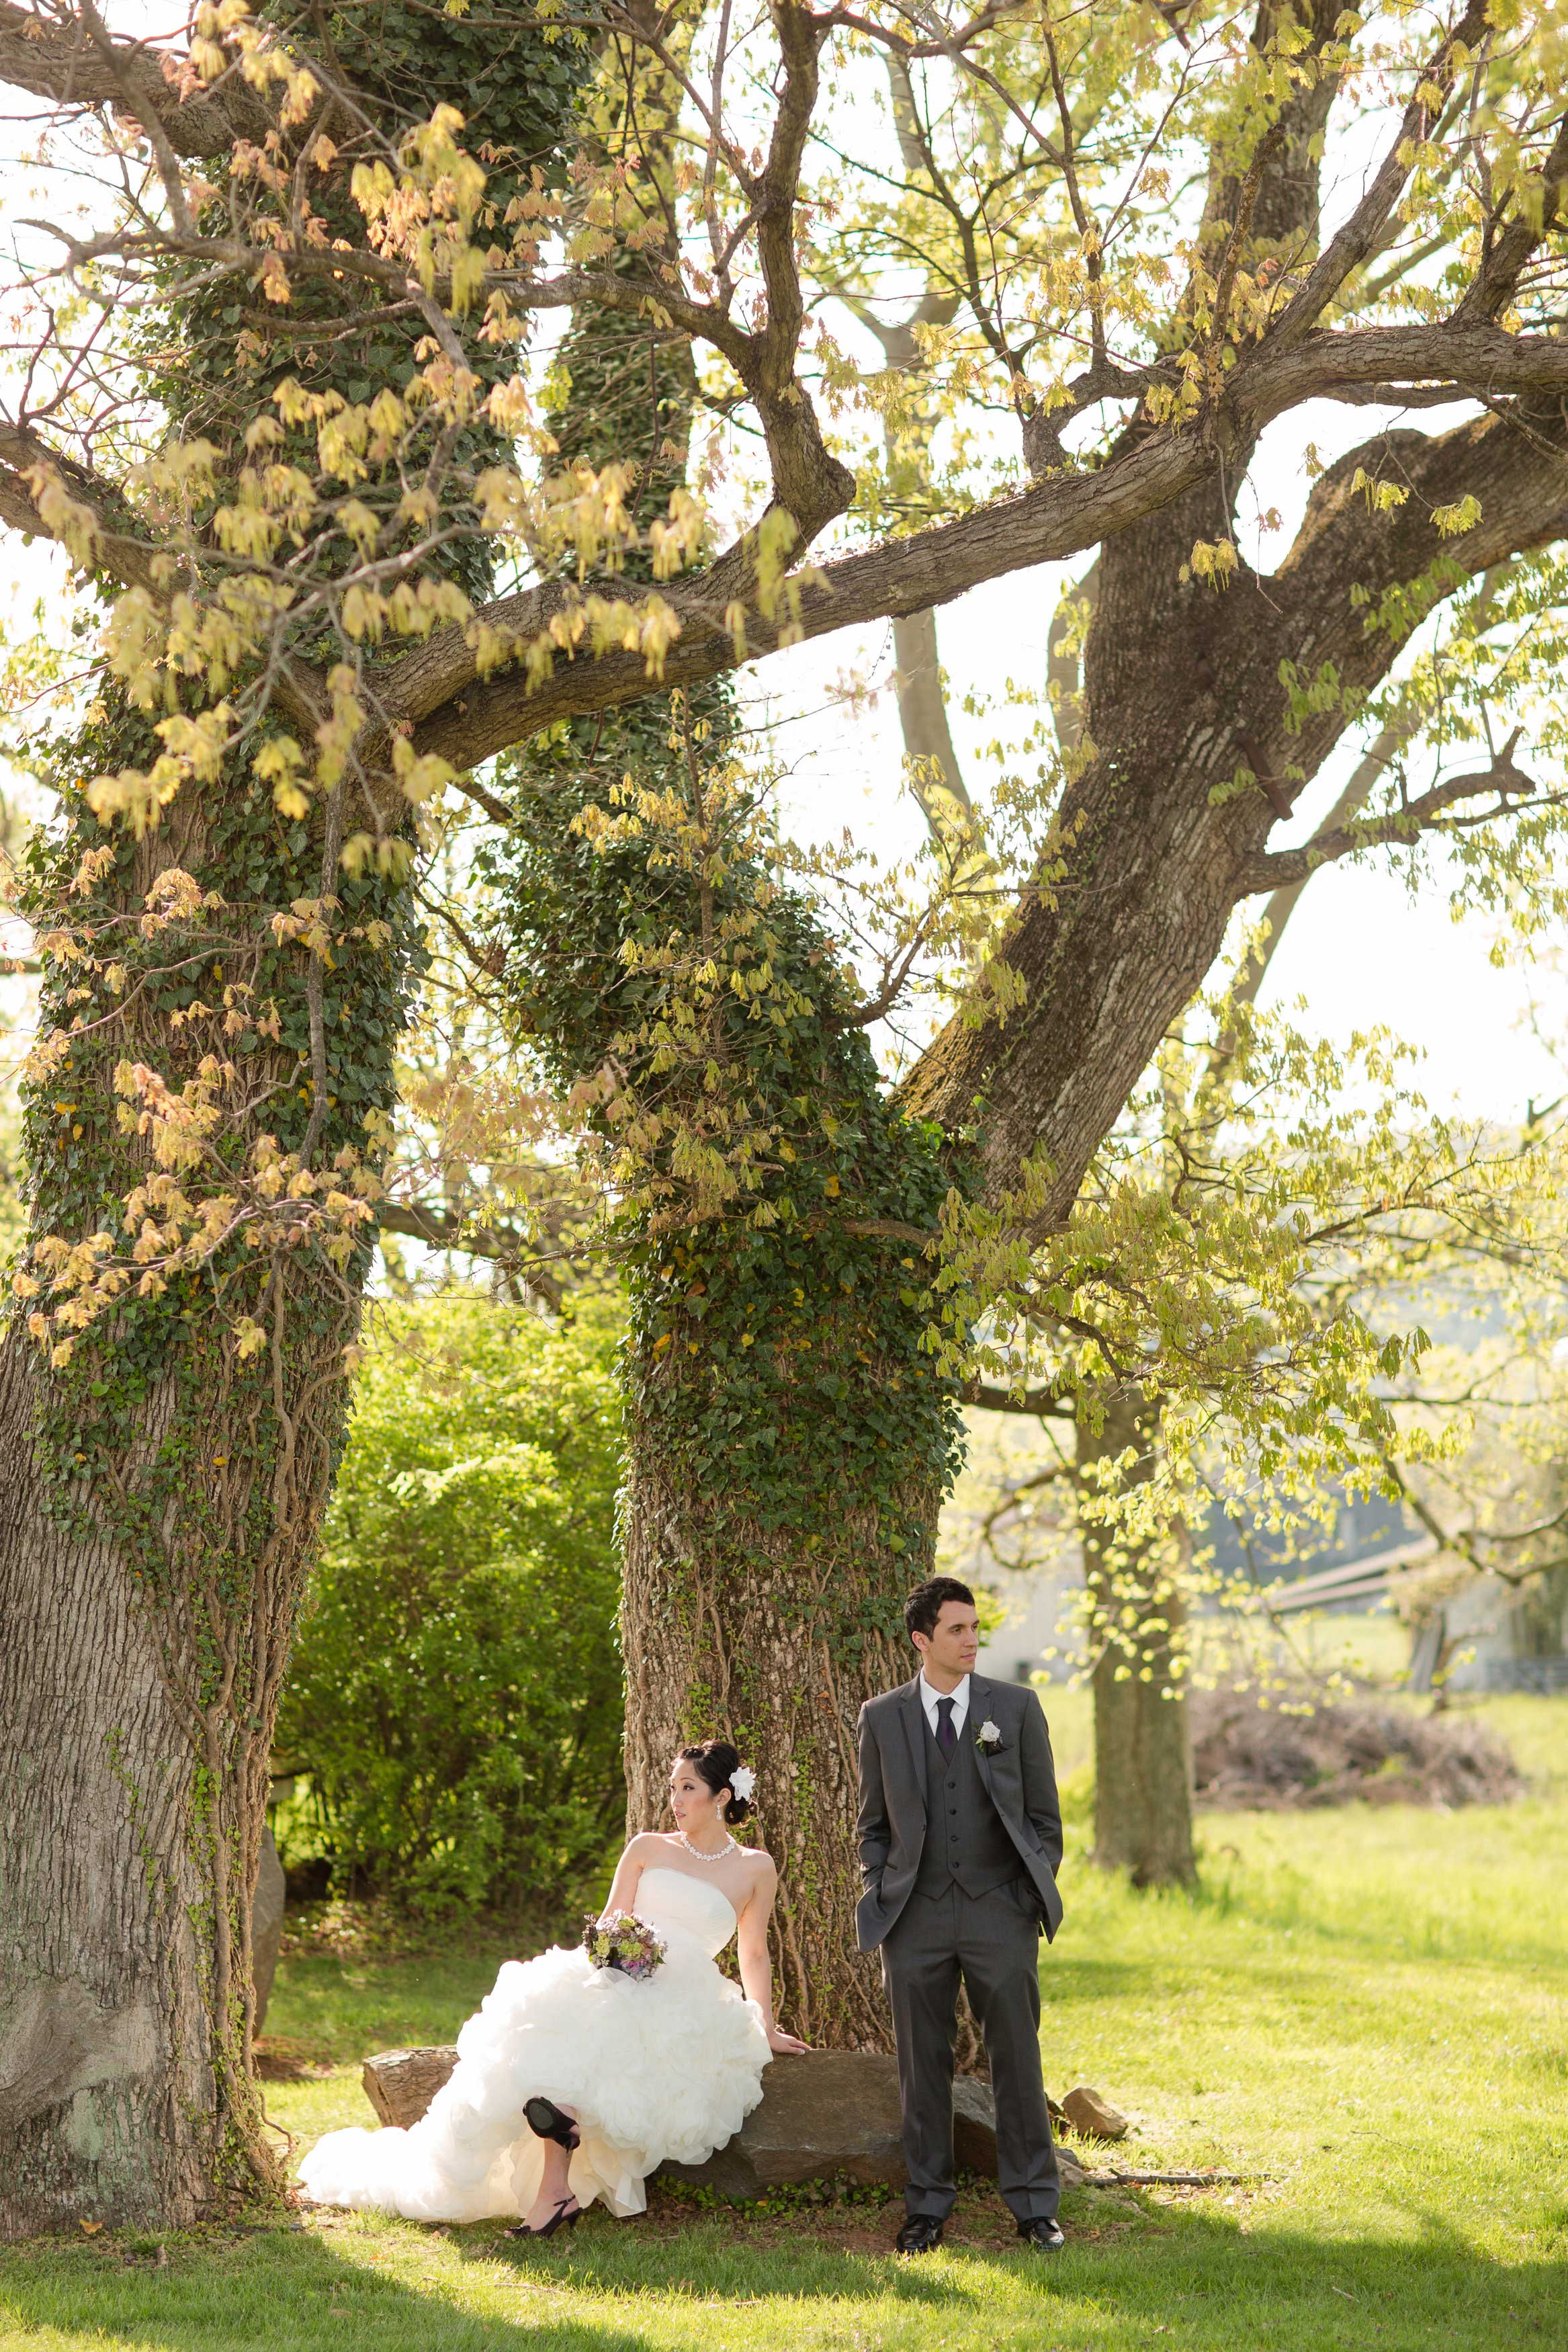 April 27, 2013 - Julie and Jason Wampler Wedding